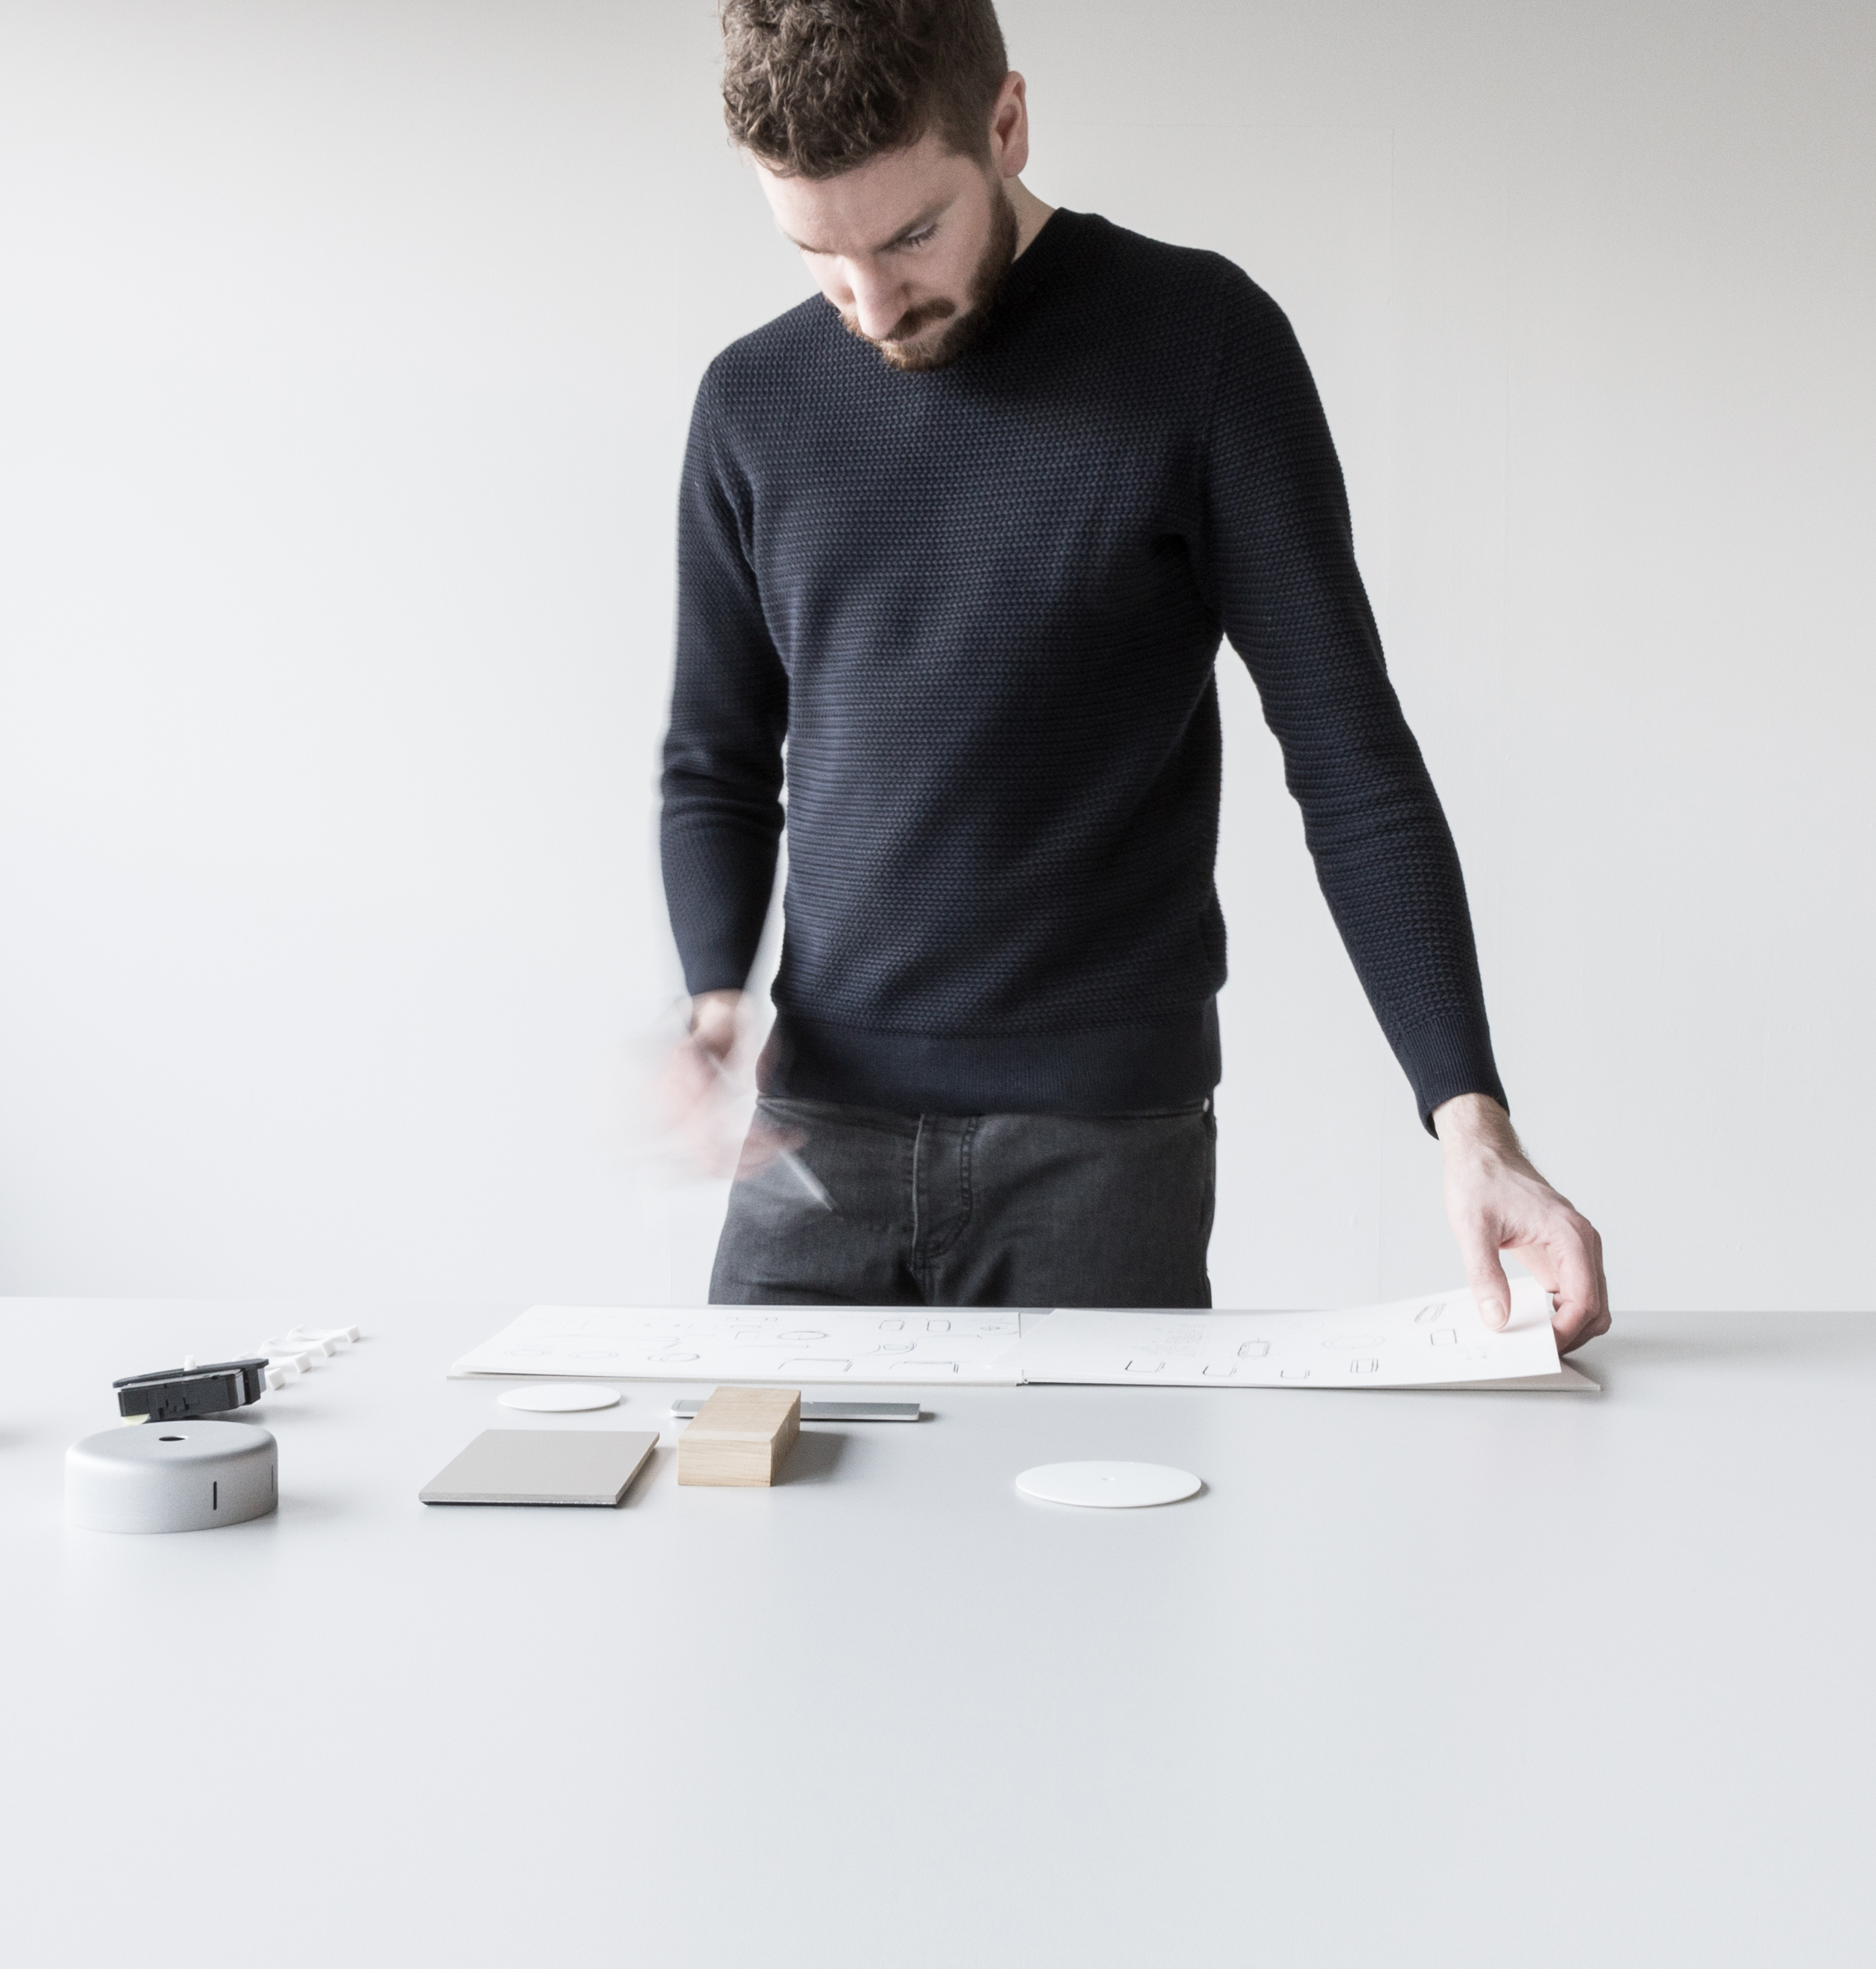 Dutch designer Remi van Oers